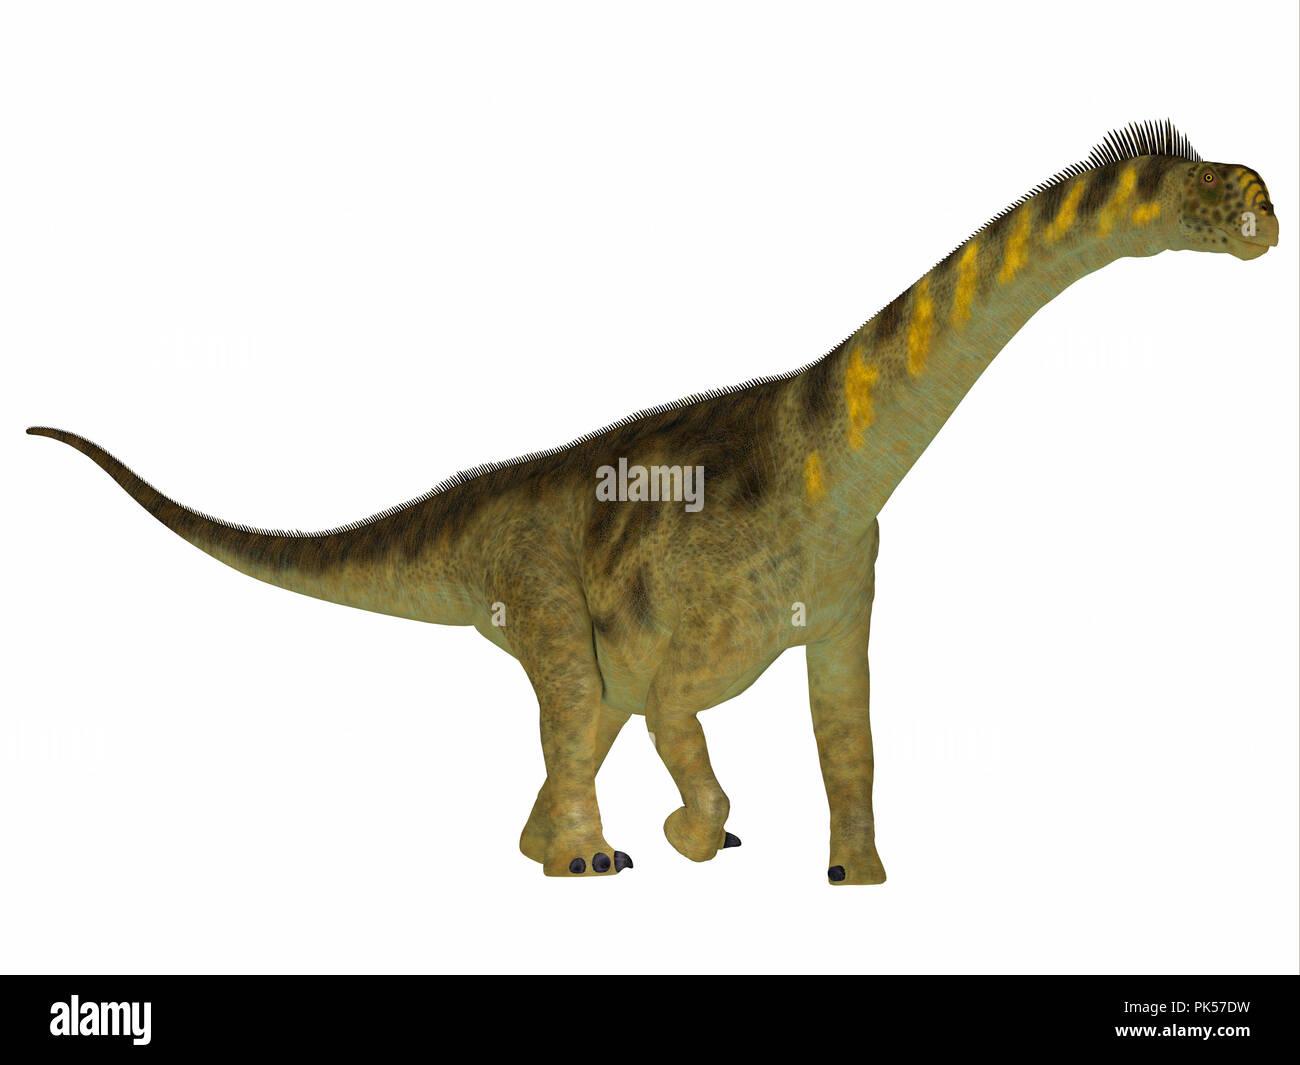 Camarasaurus Dinosaur Side Profile - Camarasaurus was a herbivorous sauropod dinosaur that lived in North America during the Jurassic Period. - Stock Image